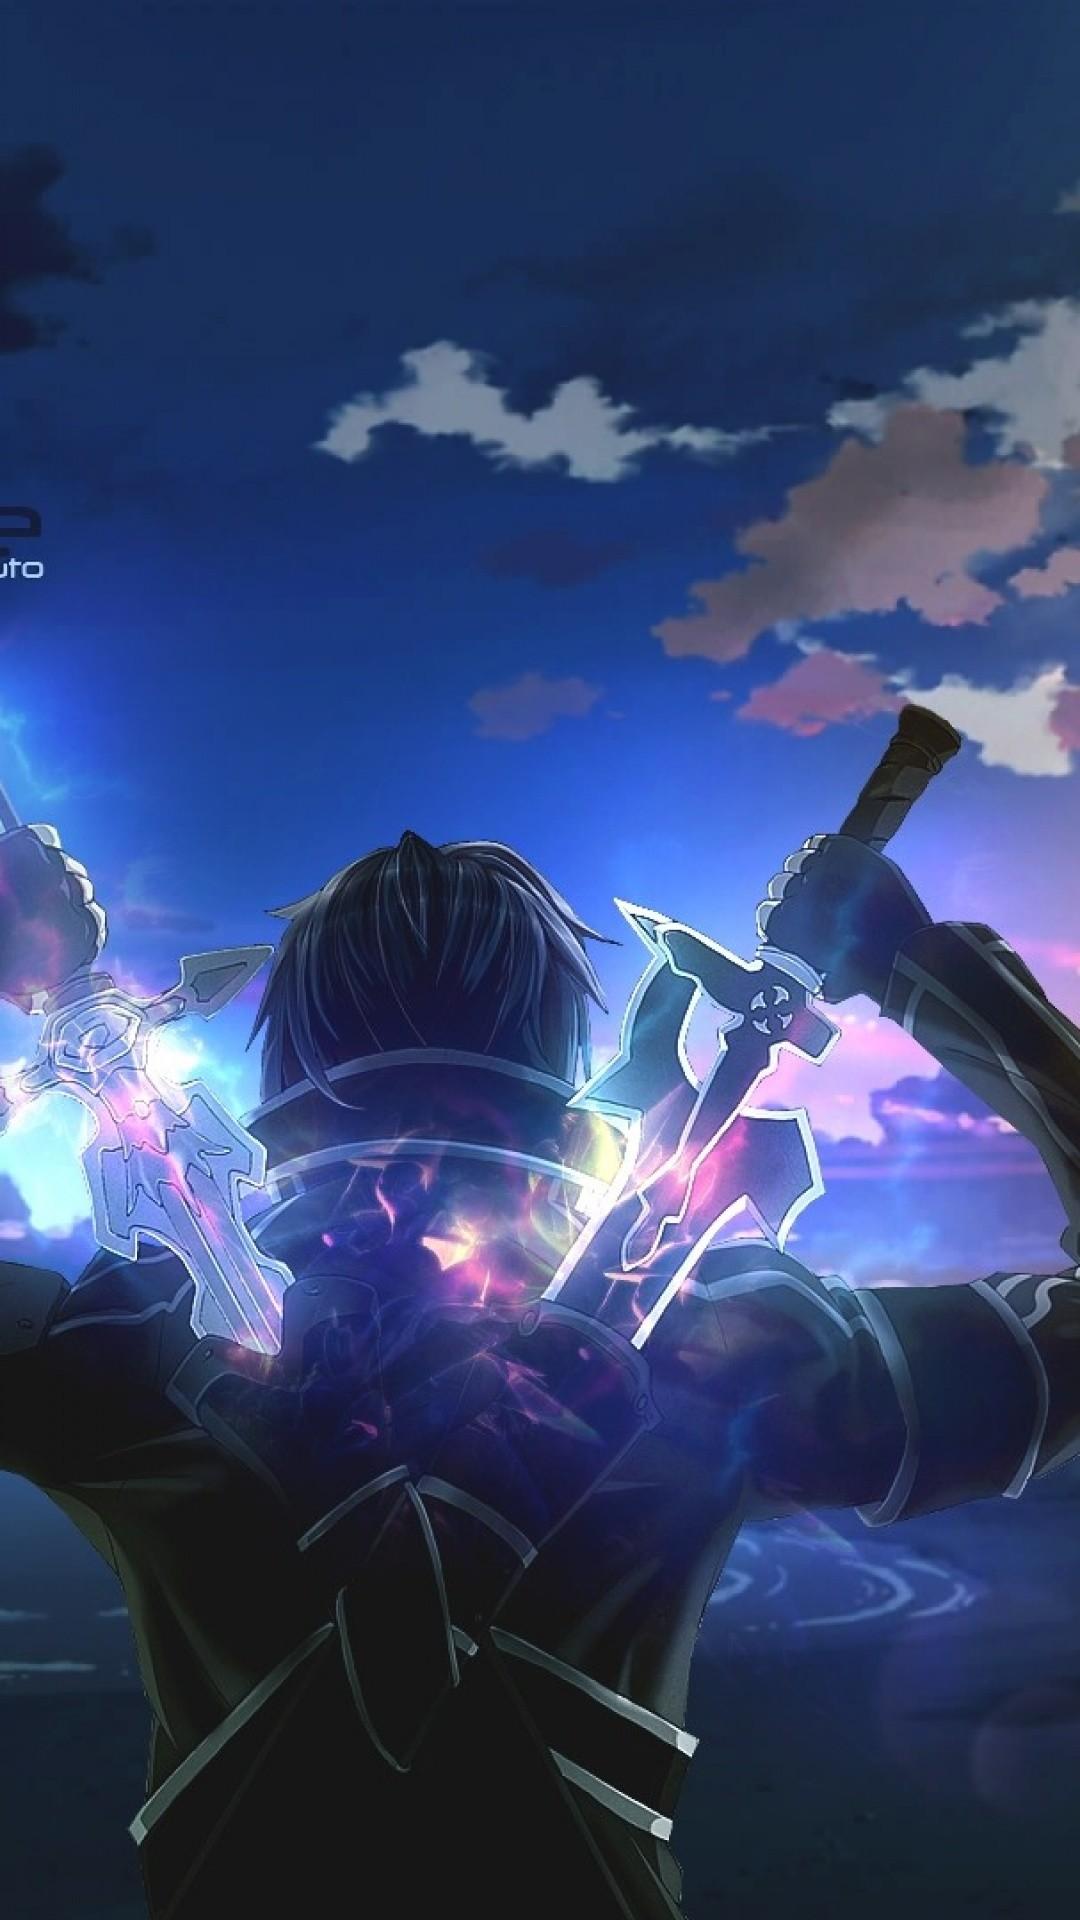 Sword Art Online v1-2 iPhone wallpaper